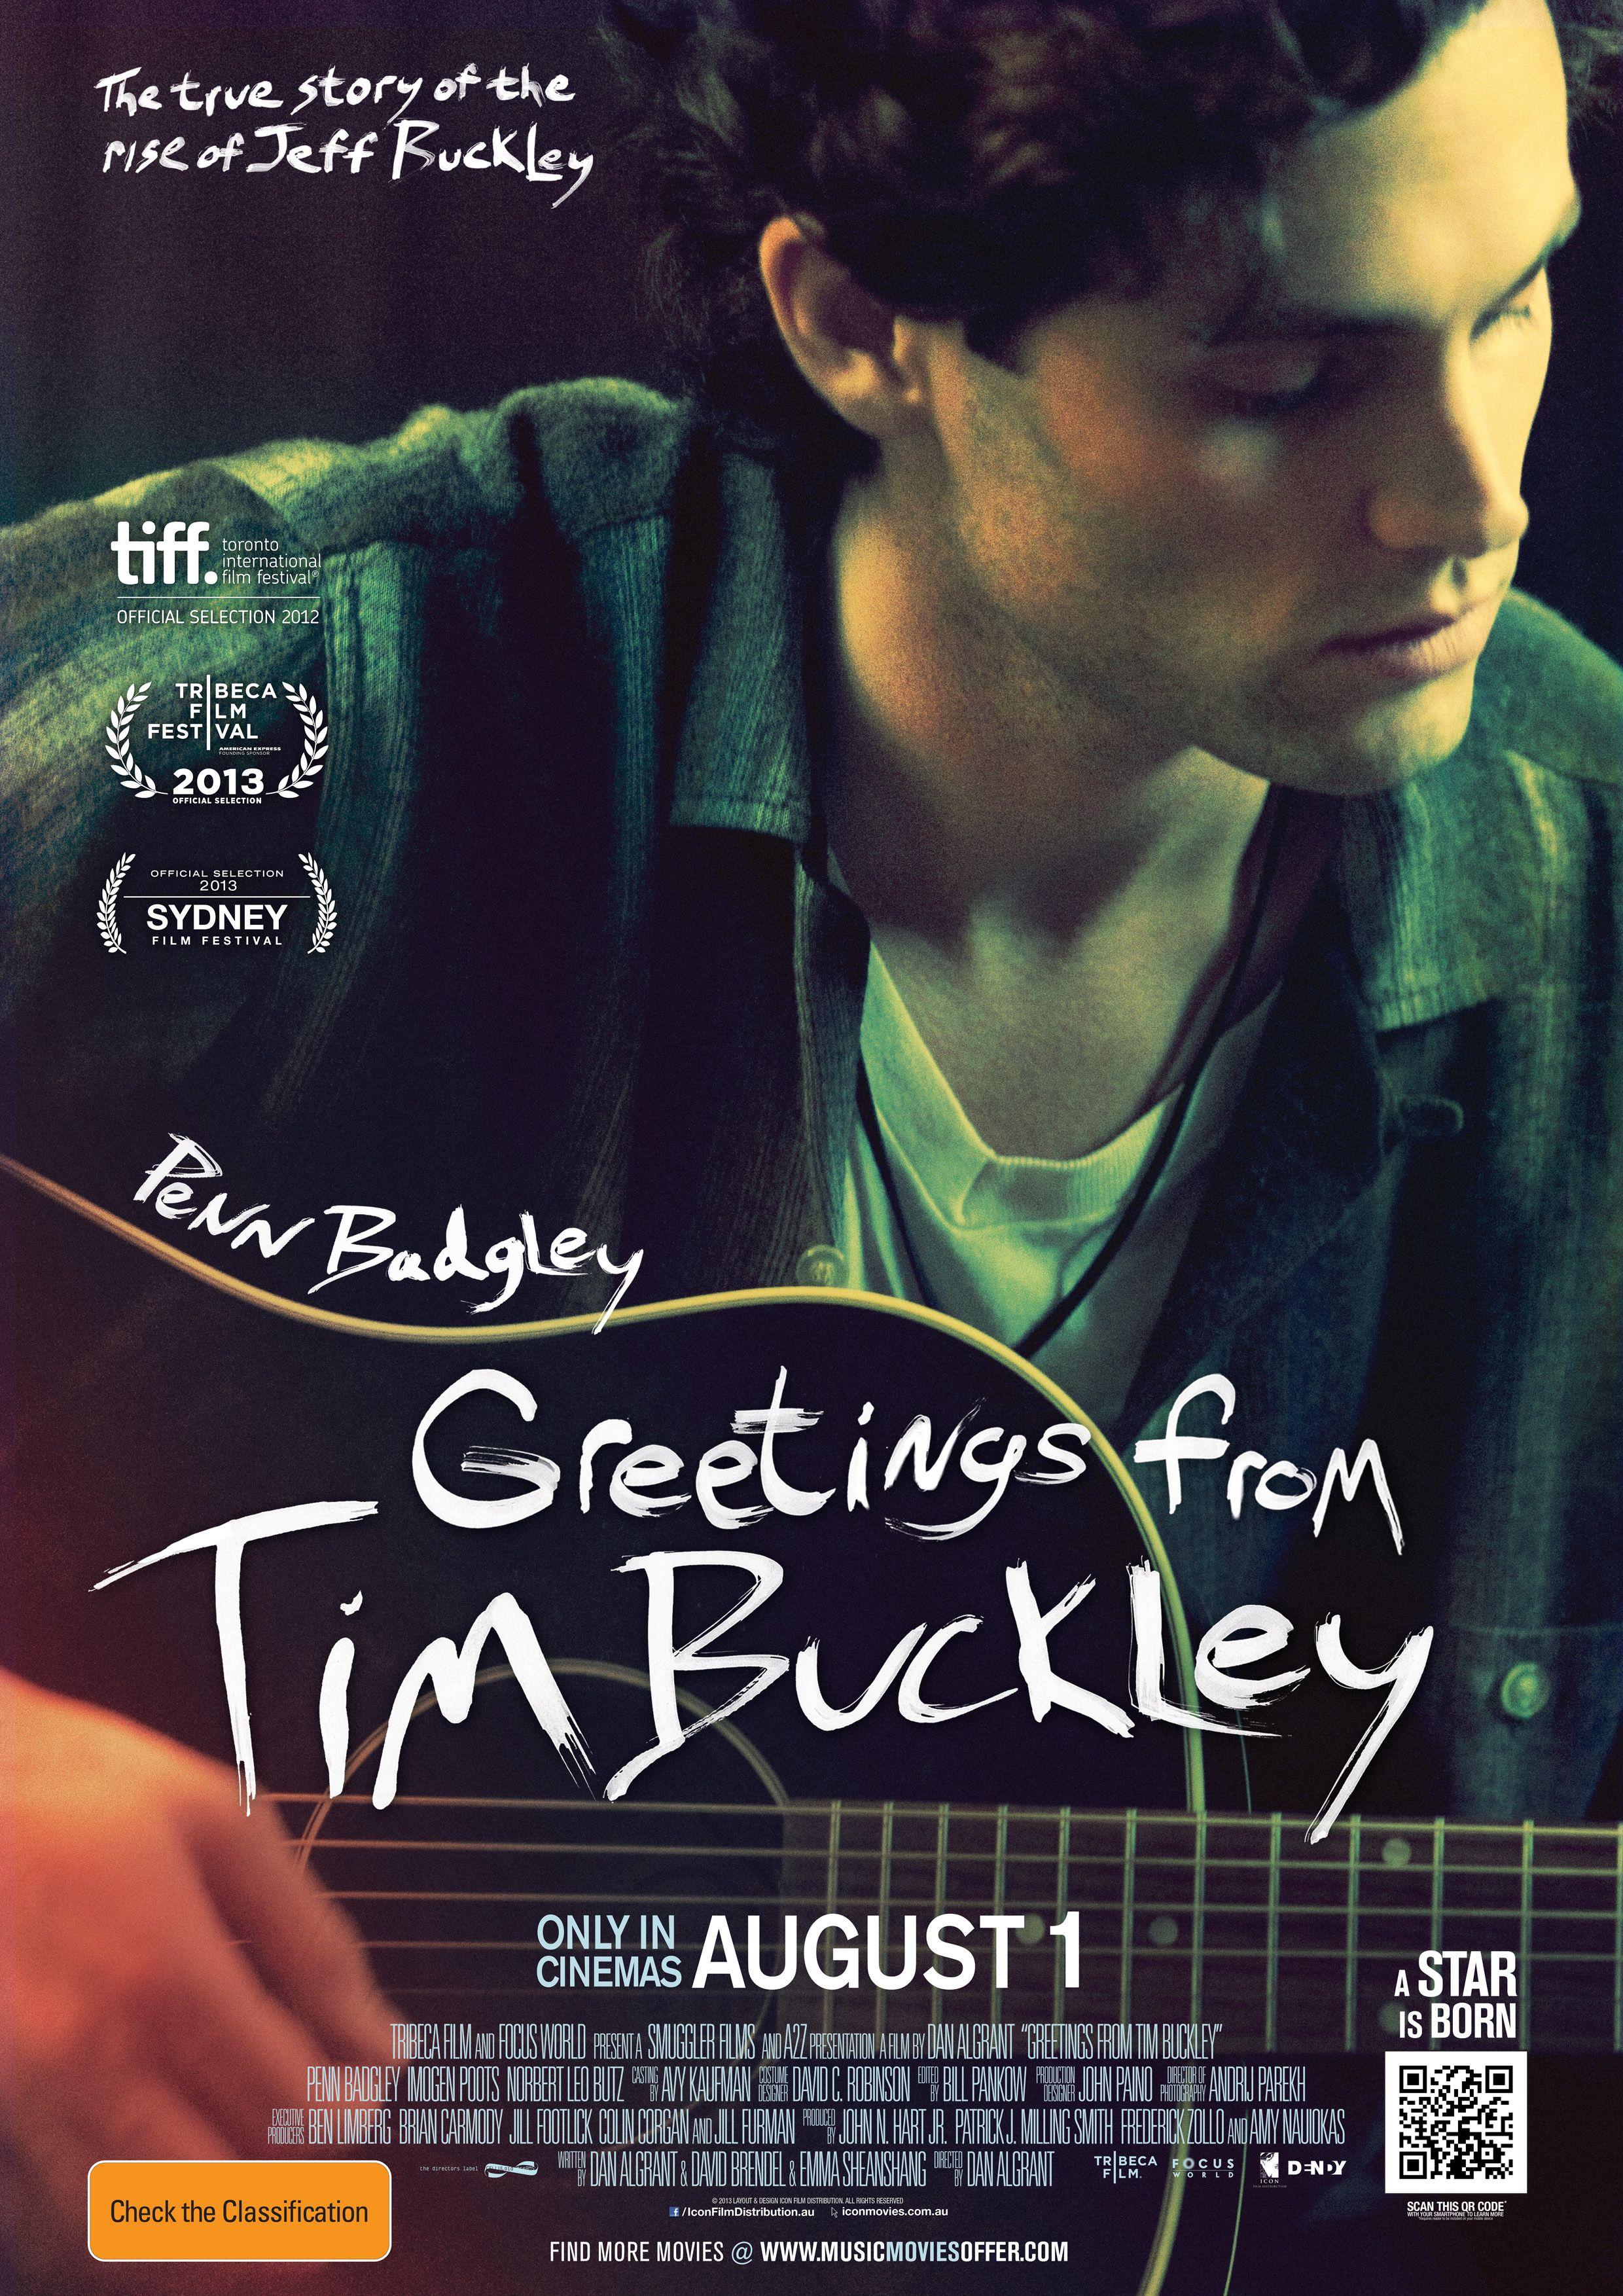 Greetings From Tim Buckley Pelcula Biogrfica De Jeff Buckley